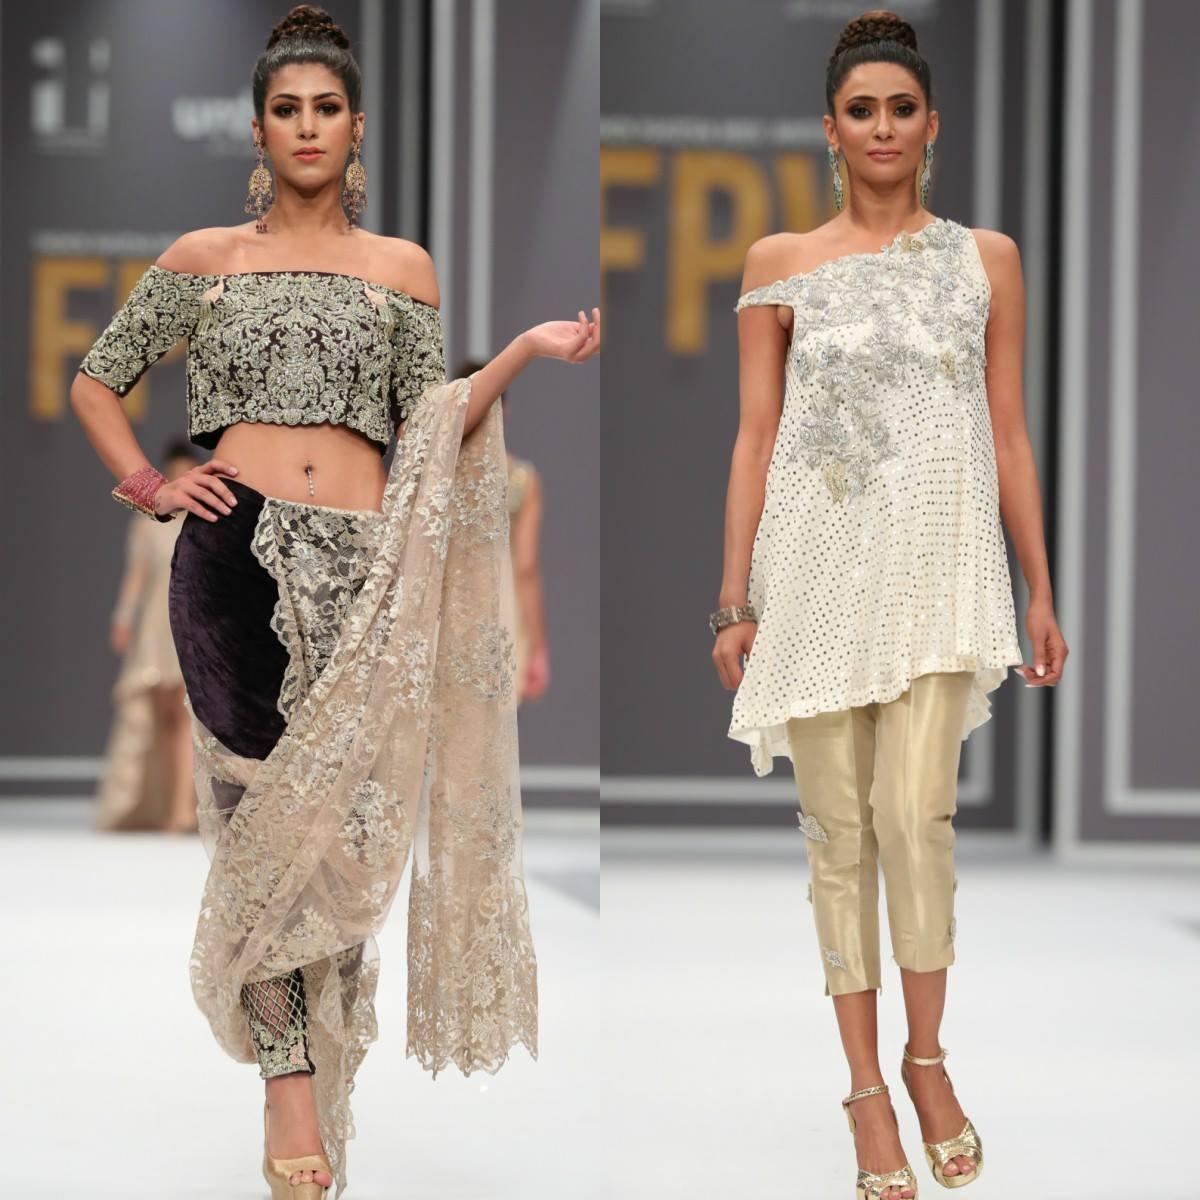 Rozina Munib's designs were unimaginative and required better finishing